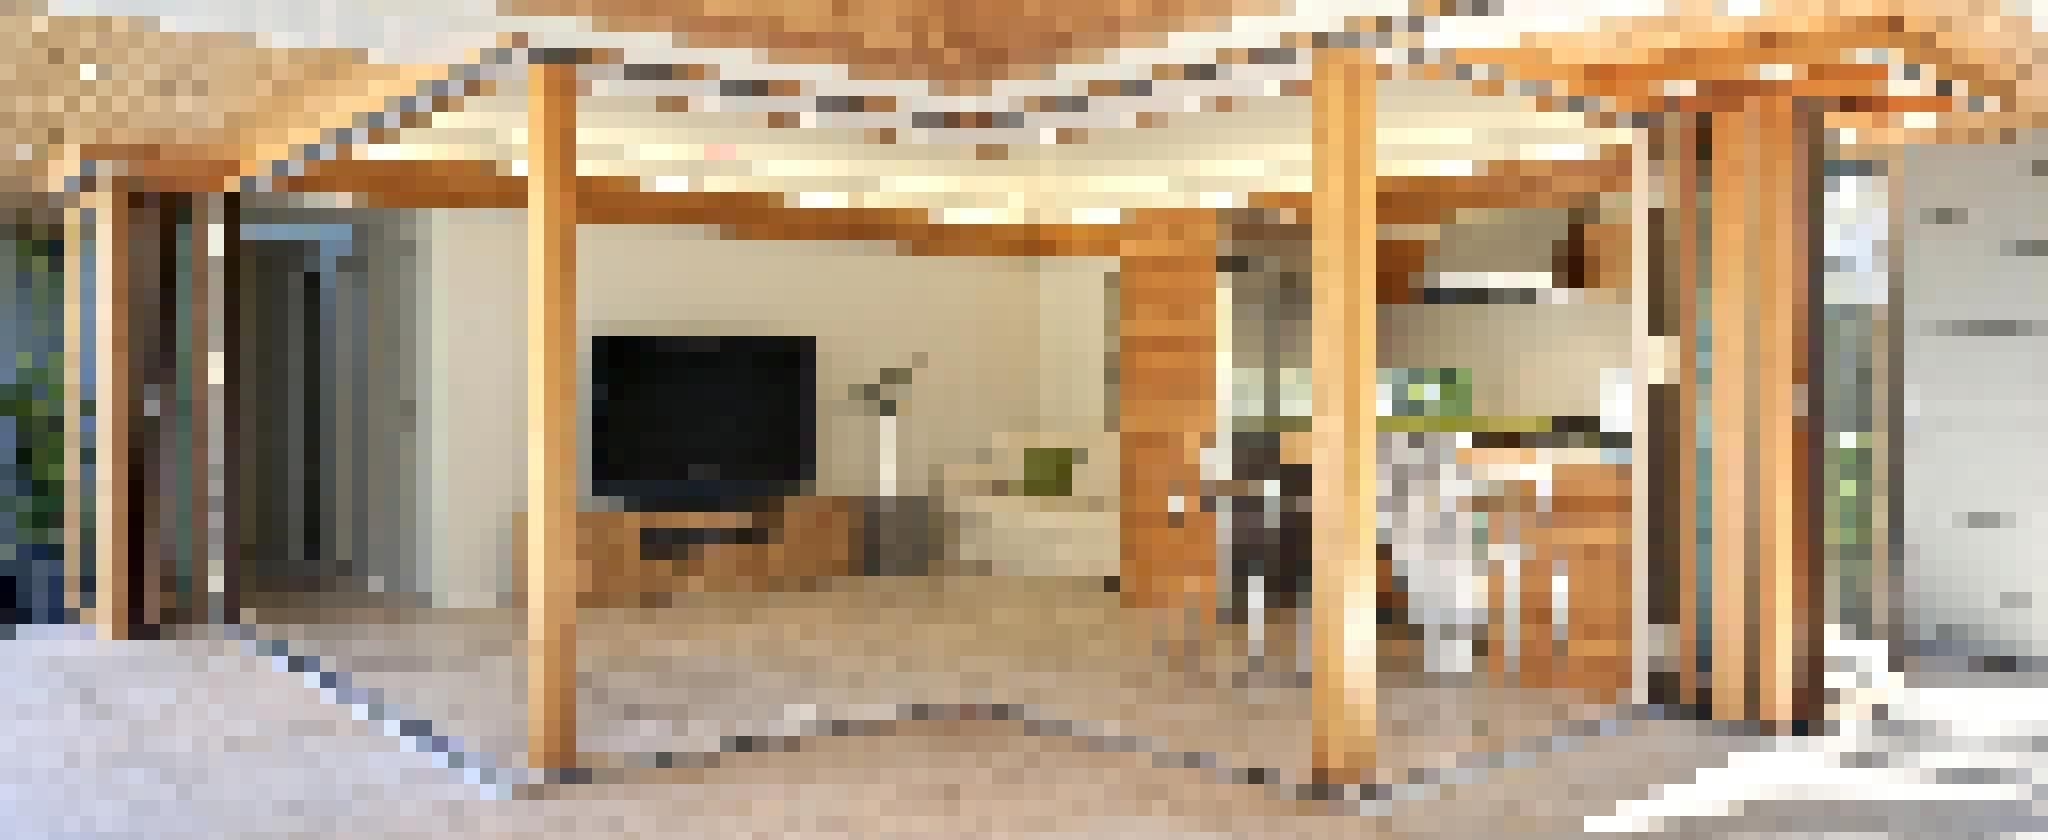 Wood FramedSlidingGlass Walls - Highlights